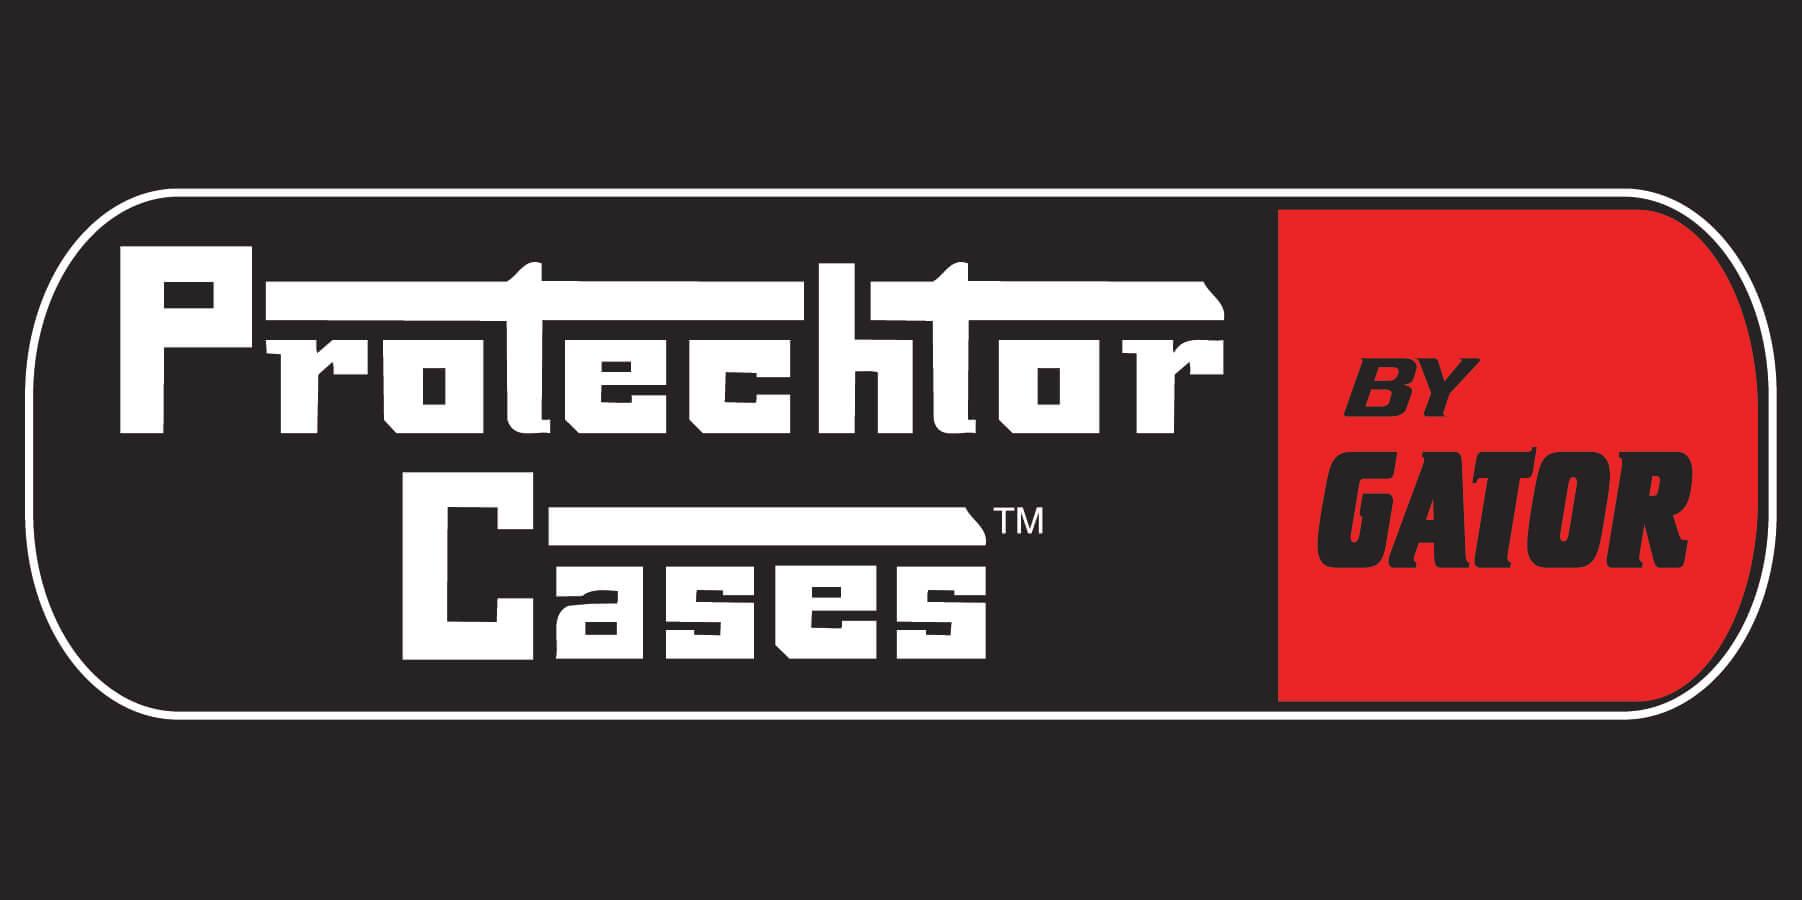 Gator-Protechtor_Logo